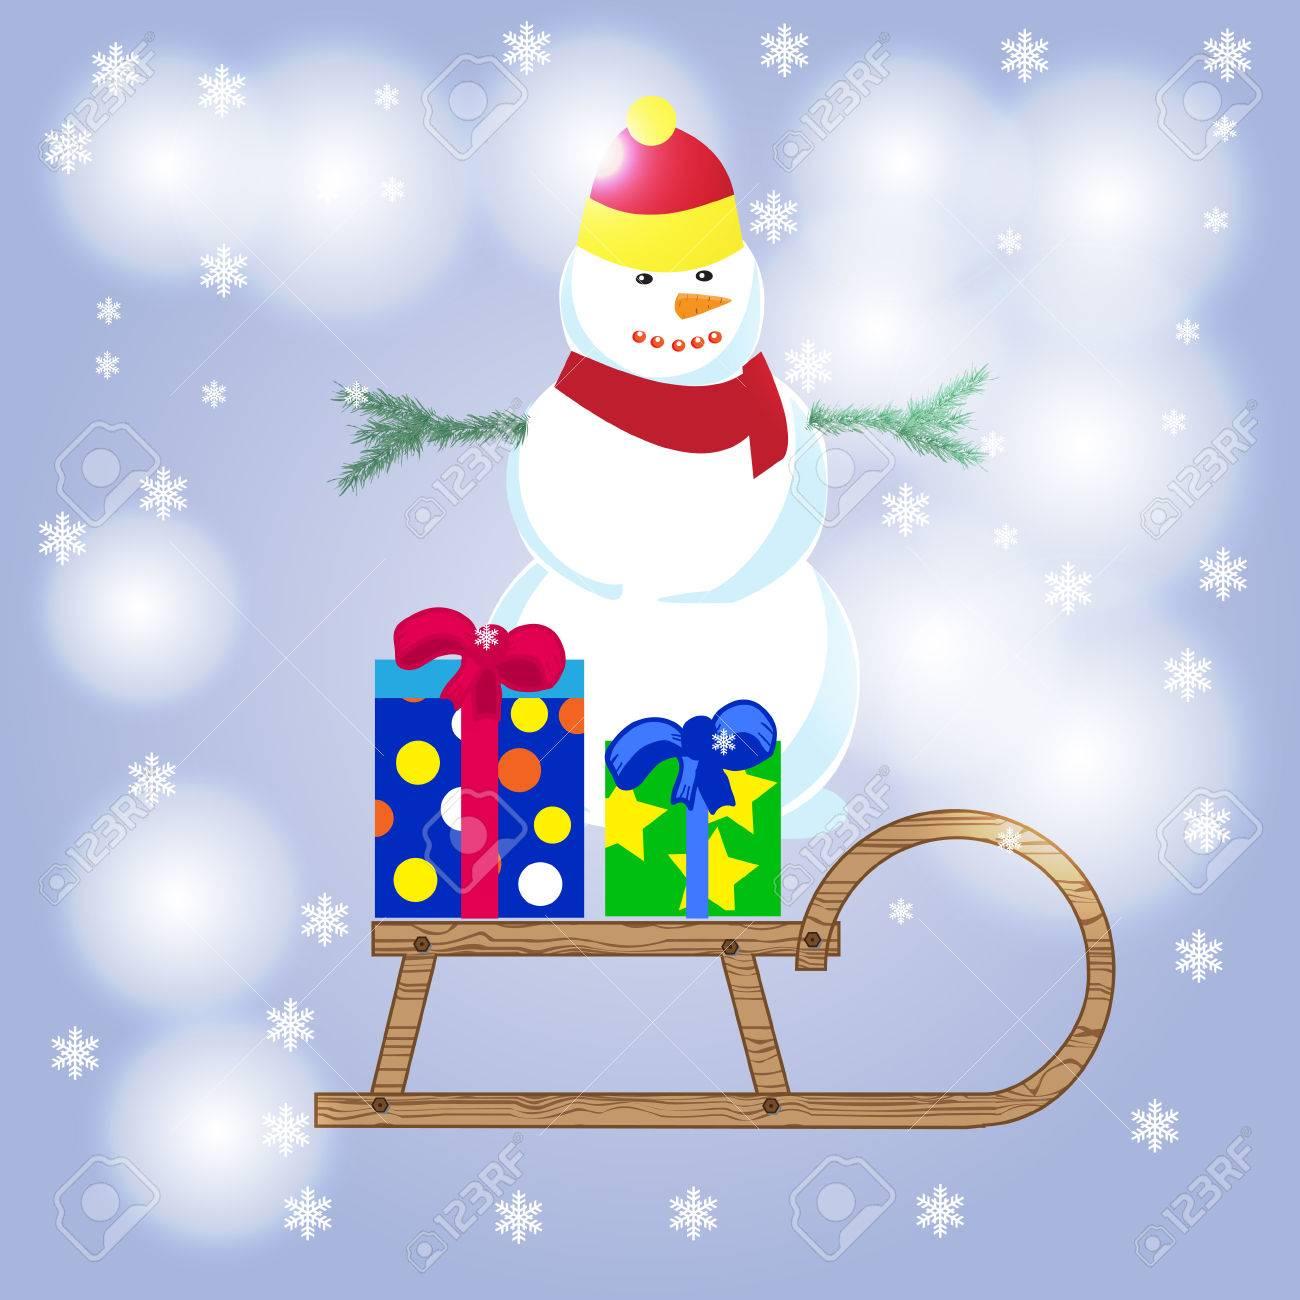 Merry Christmas Happy Snowman Snowman Snowman Christmas